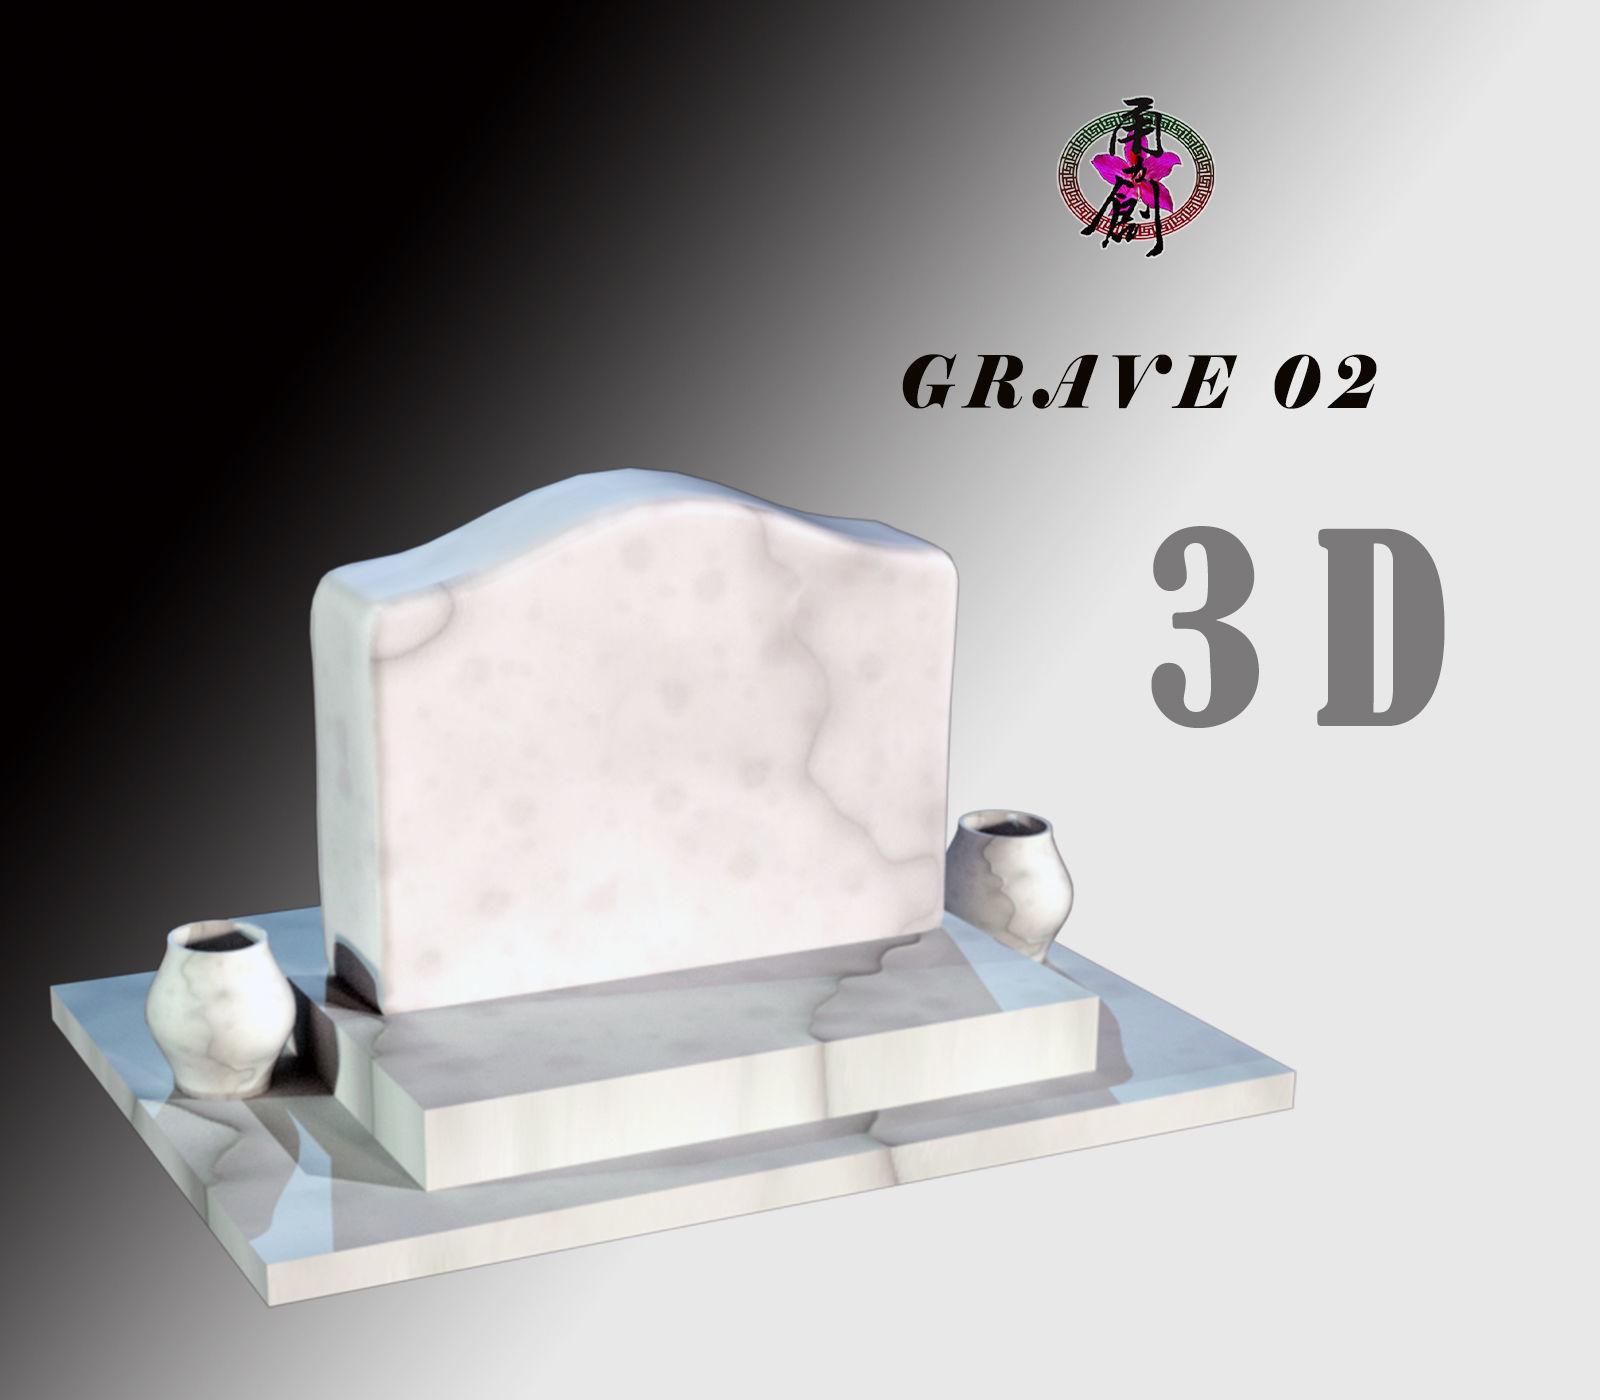 Grave-02